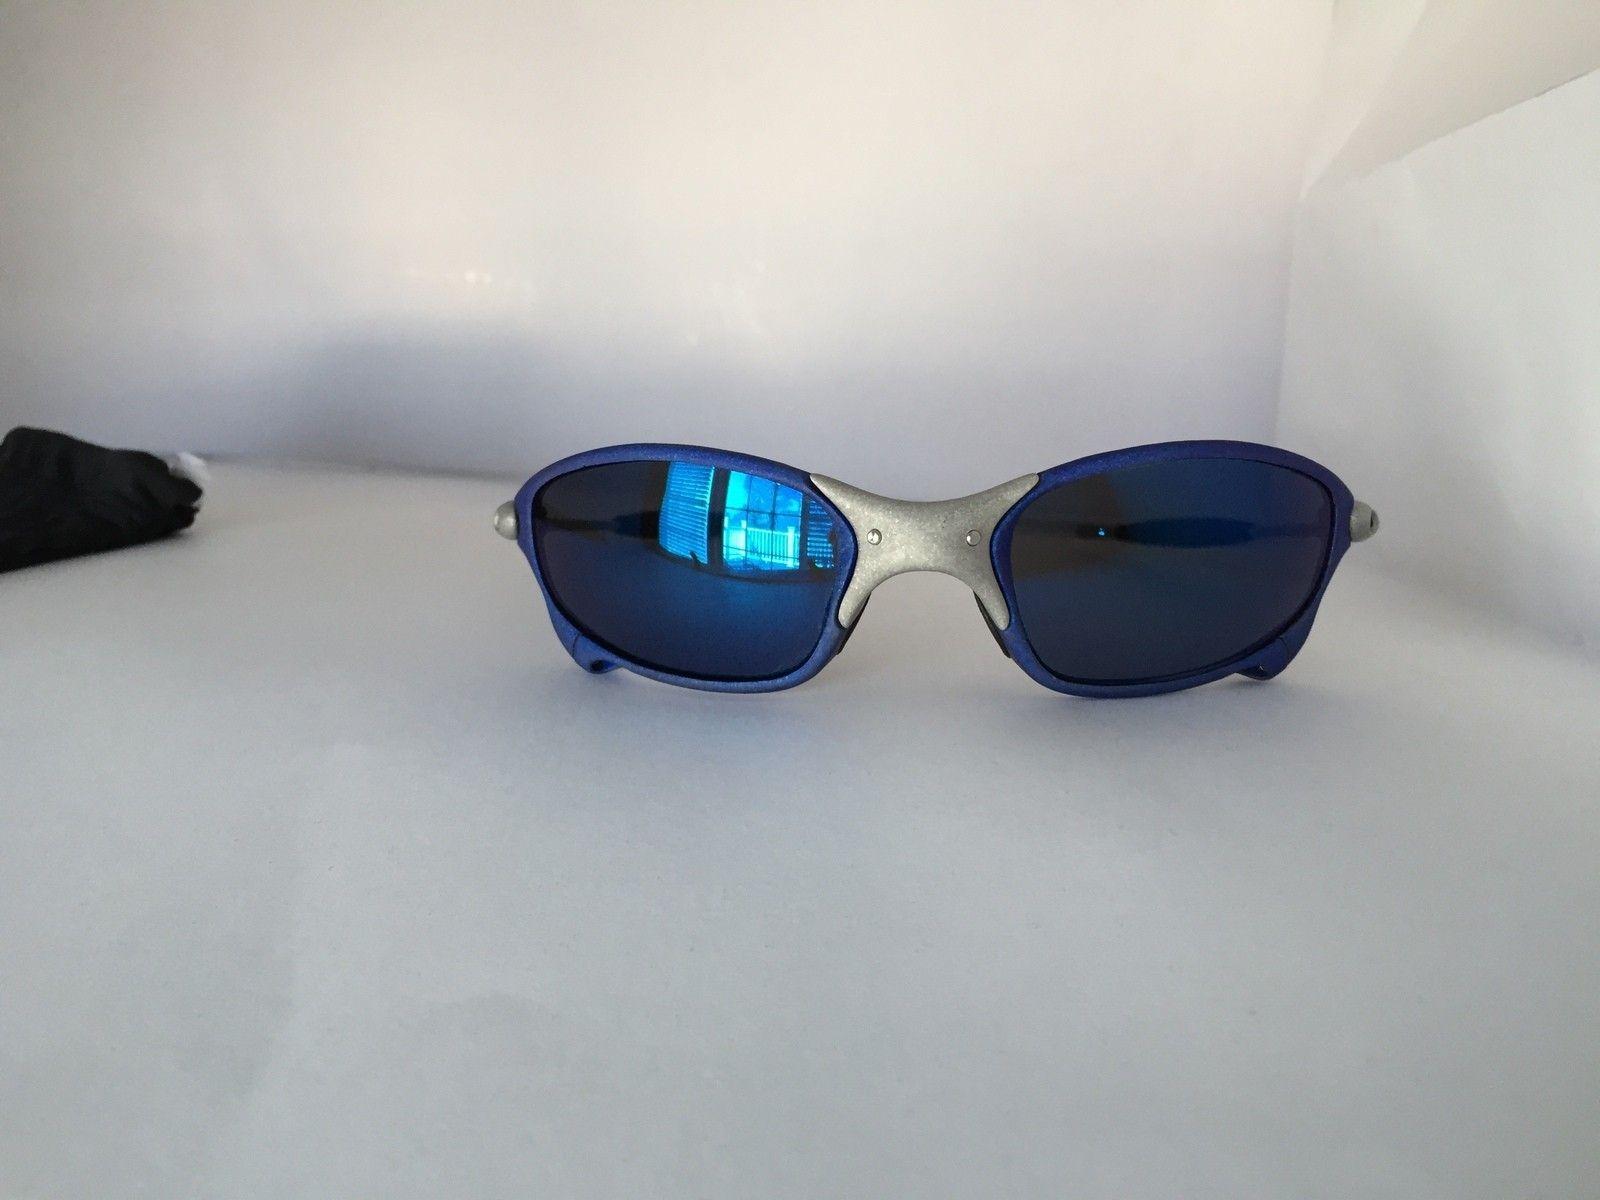 Anodized Juliet Dallas Cowboys colors Blue/Silver w/ OEM Ice Lenses - IMG_1787.JPG